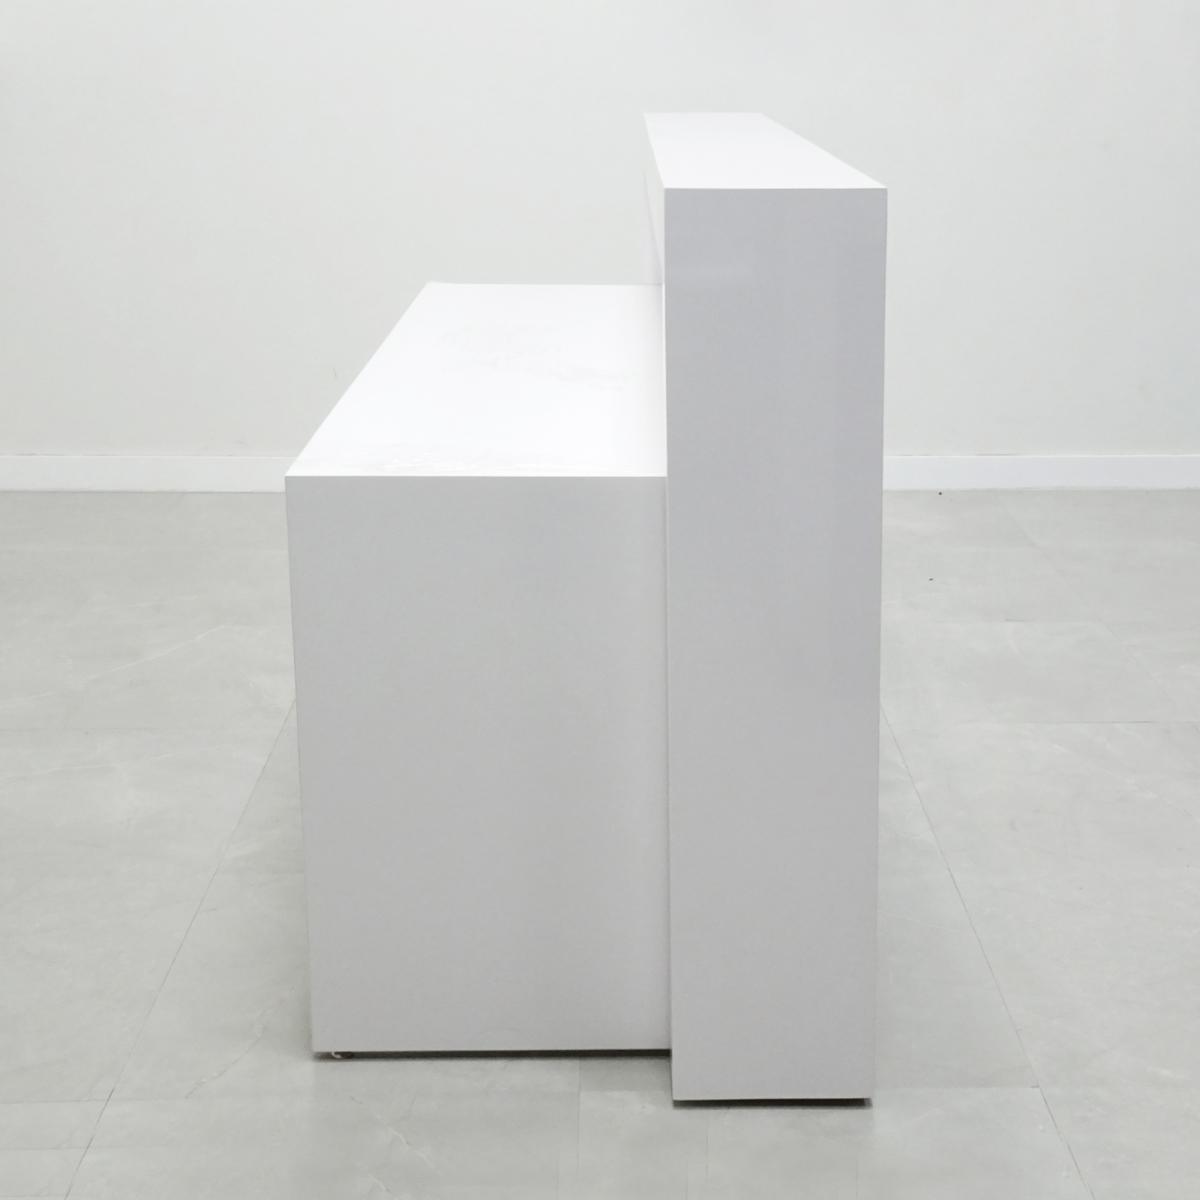 48 In. New York Reception Desk in White Gloss Laminate